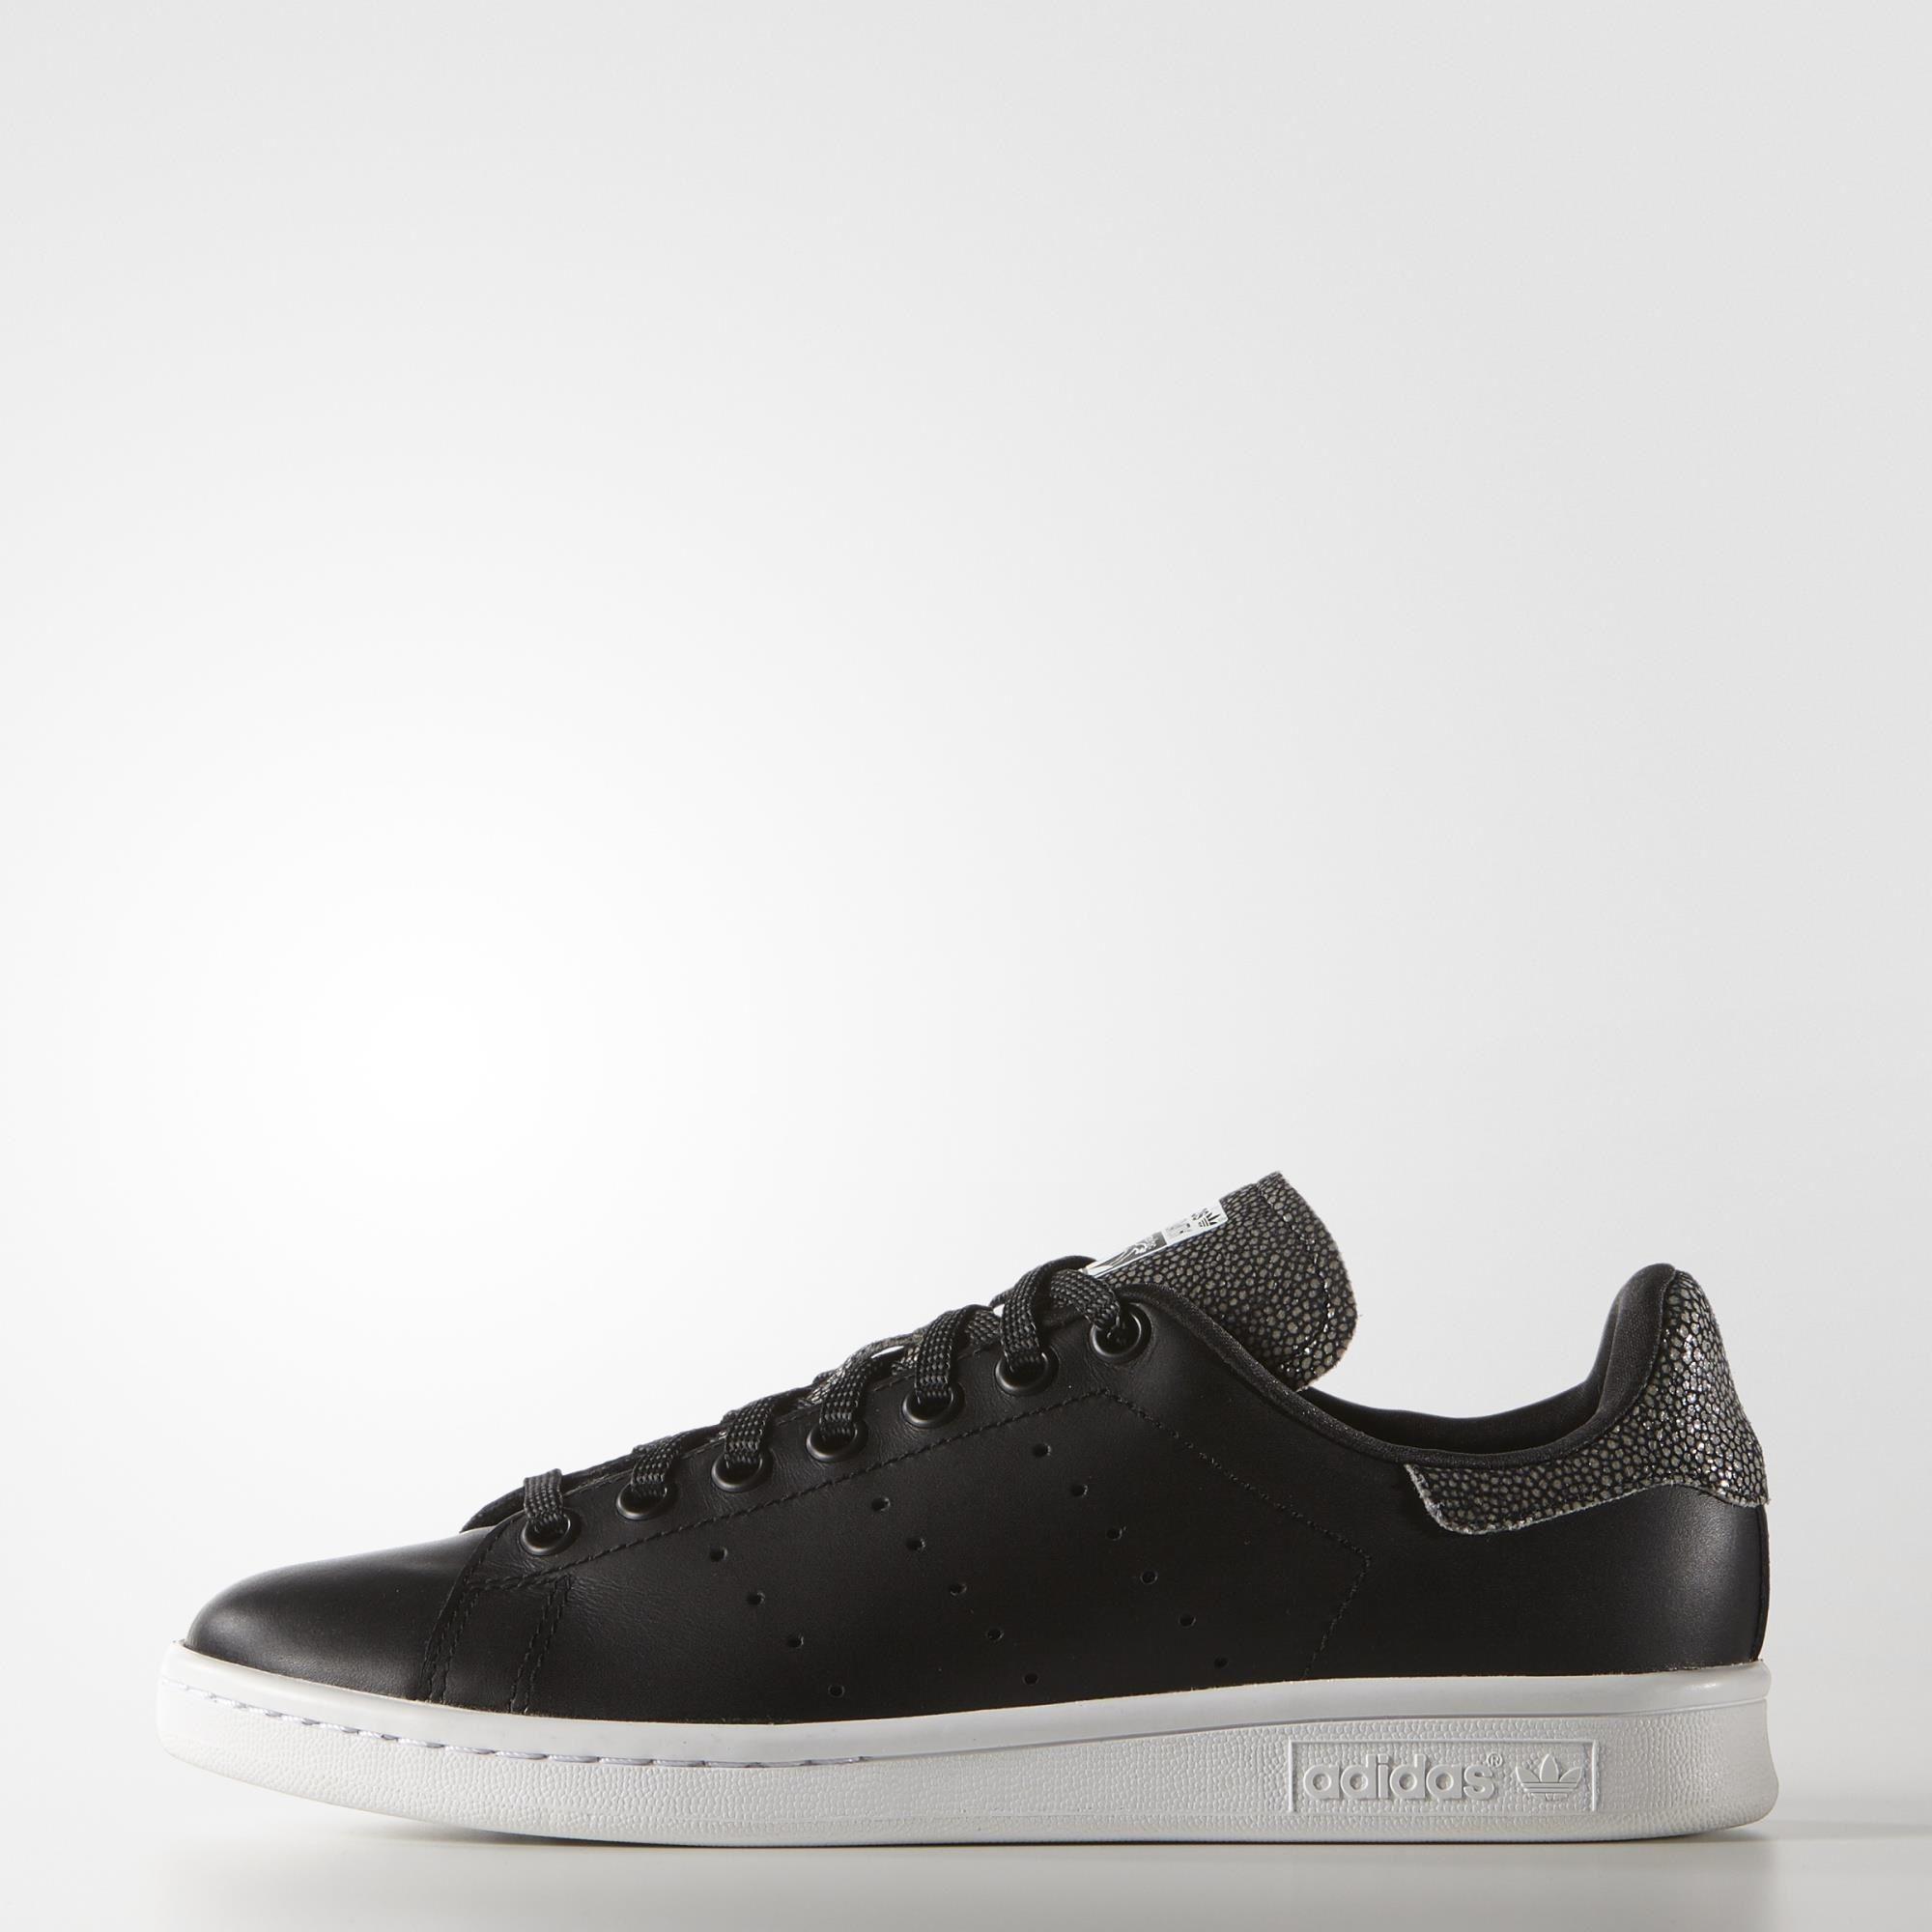 shop online original adidas us